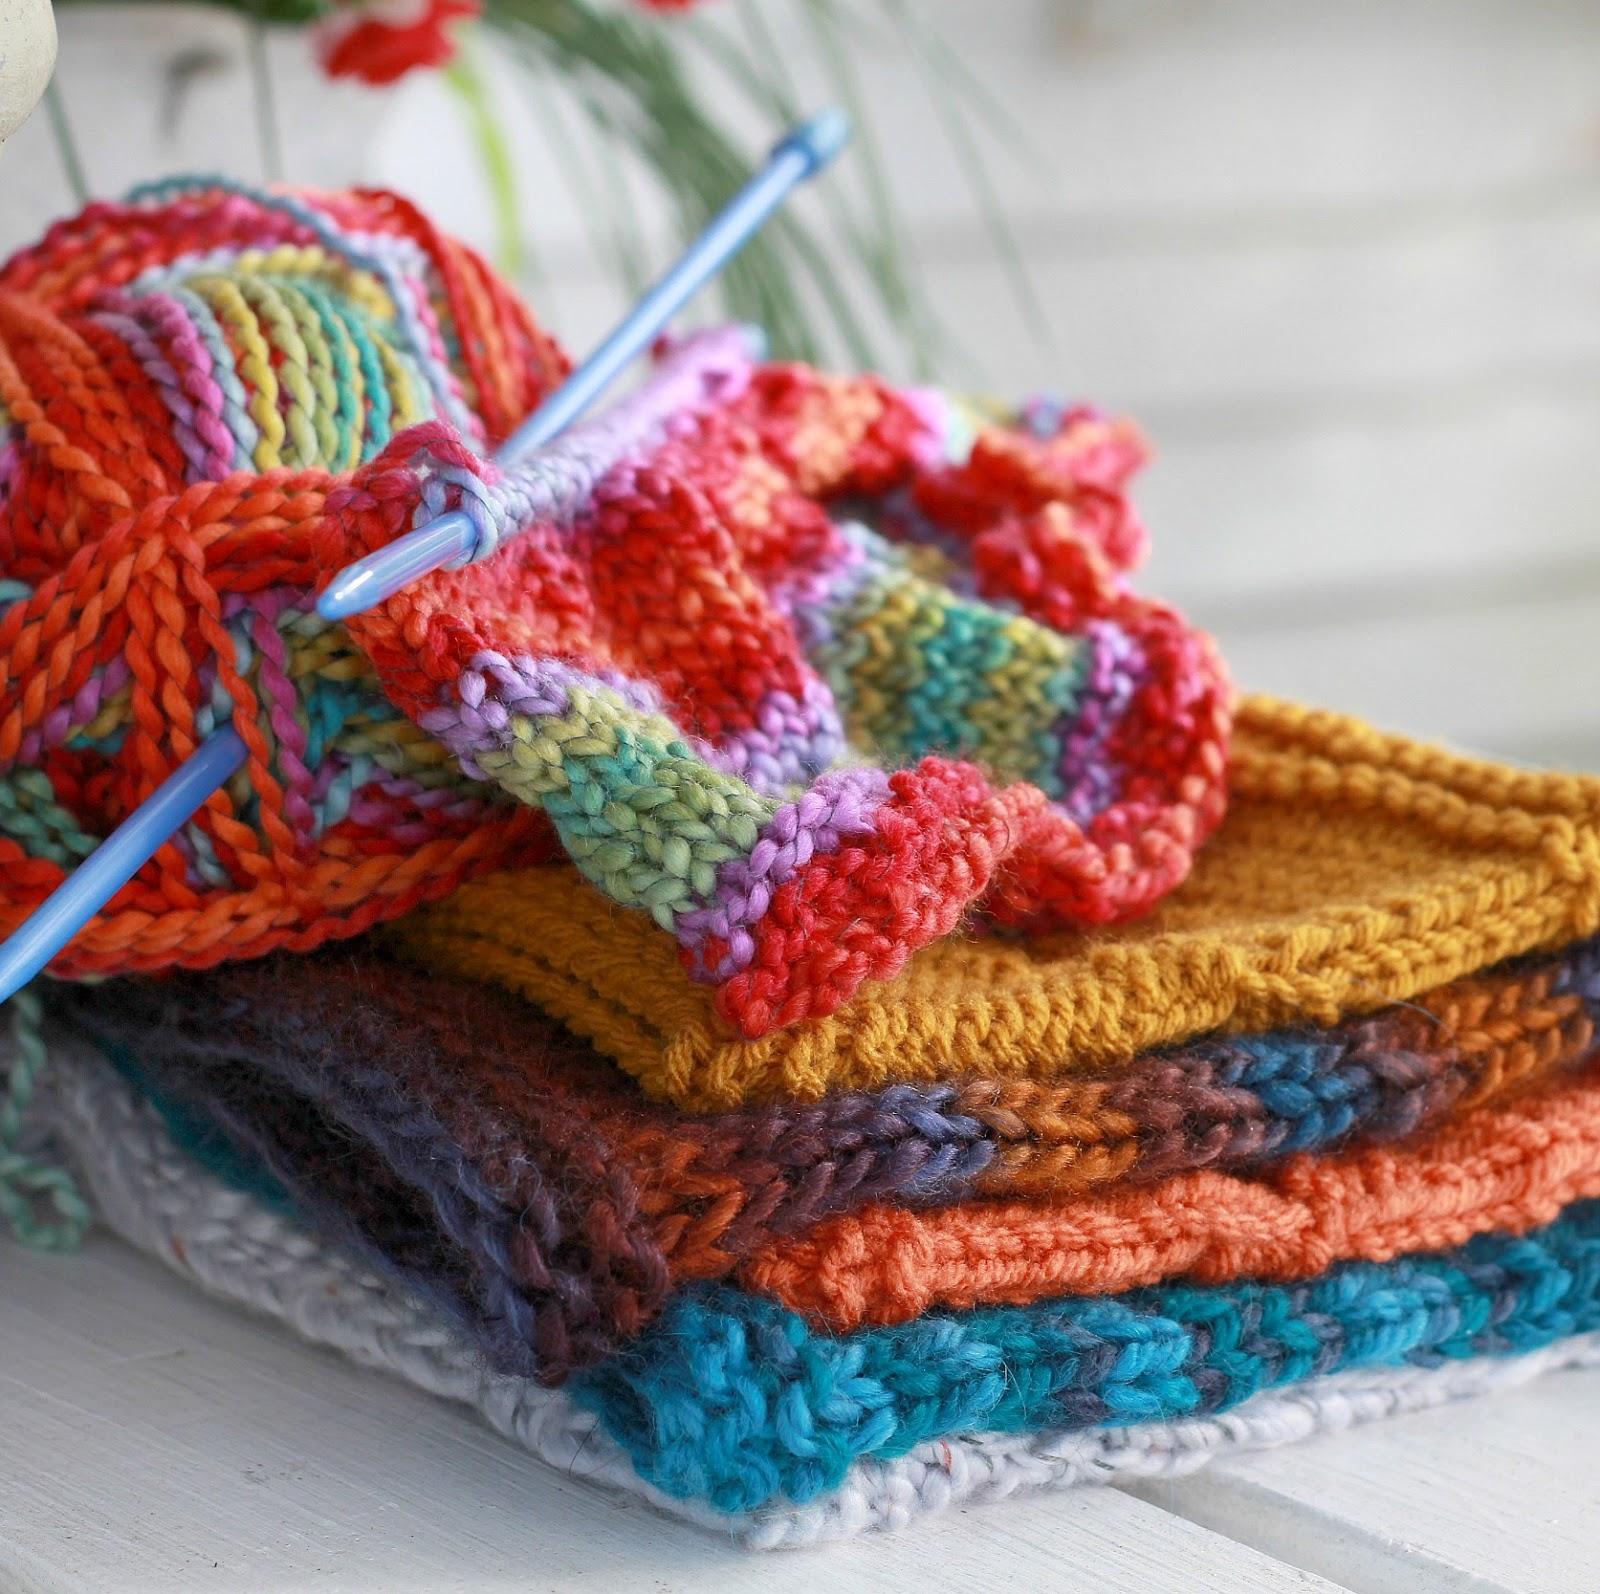 Knitted Cowl | Grateful Prayer | Thankful Heart